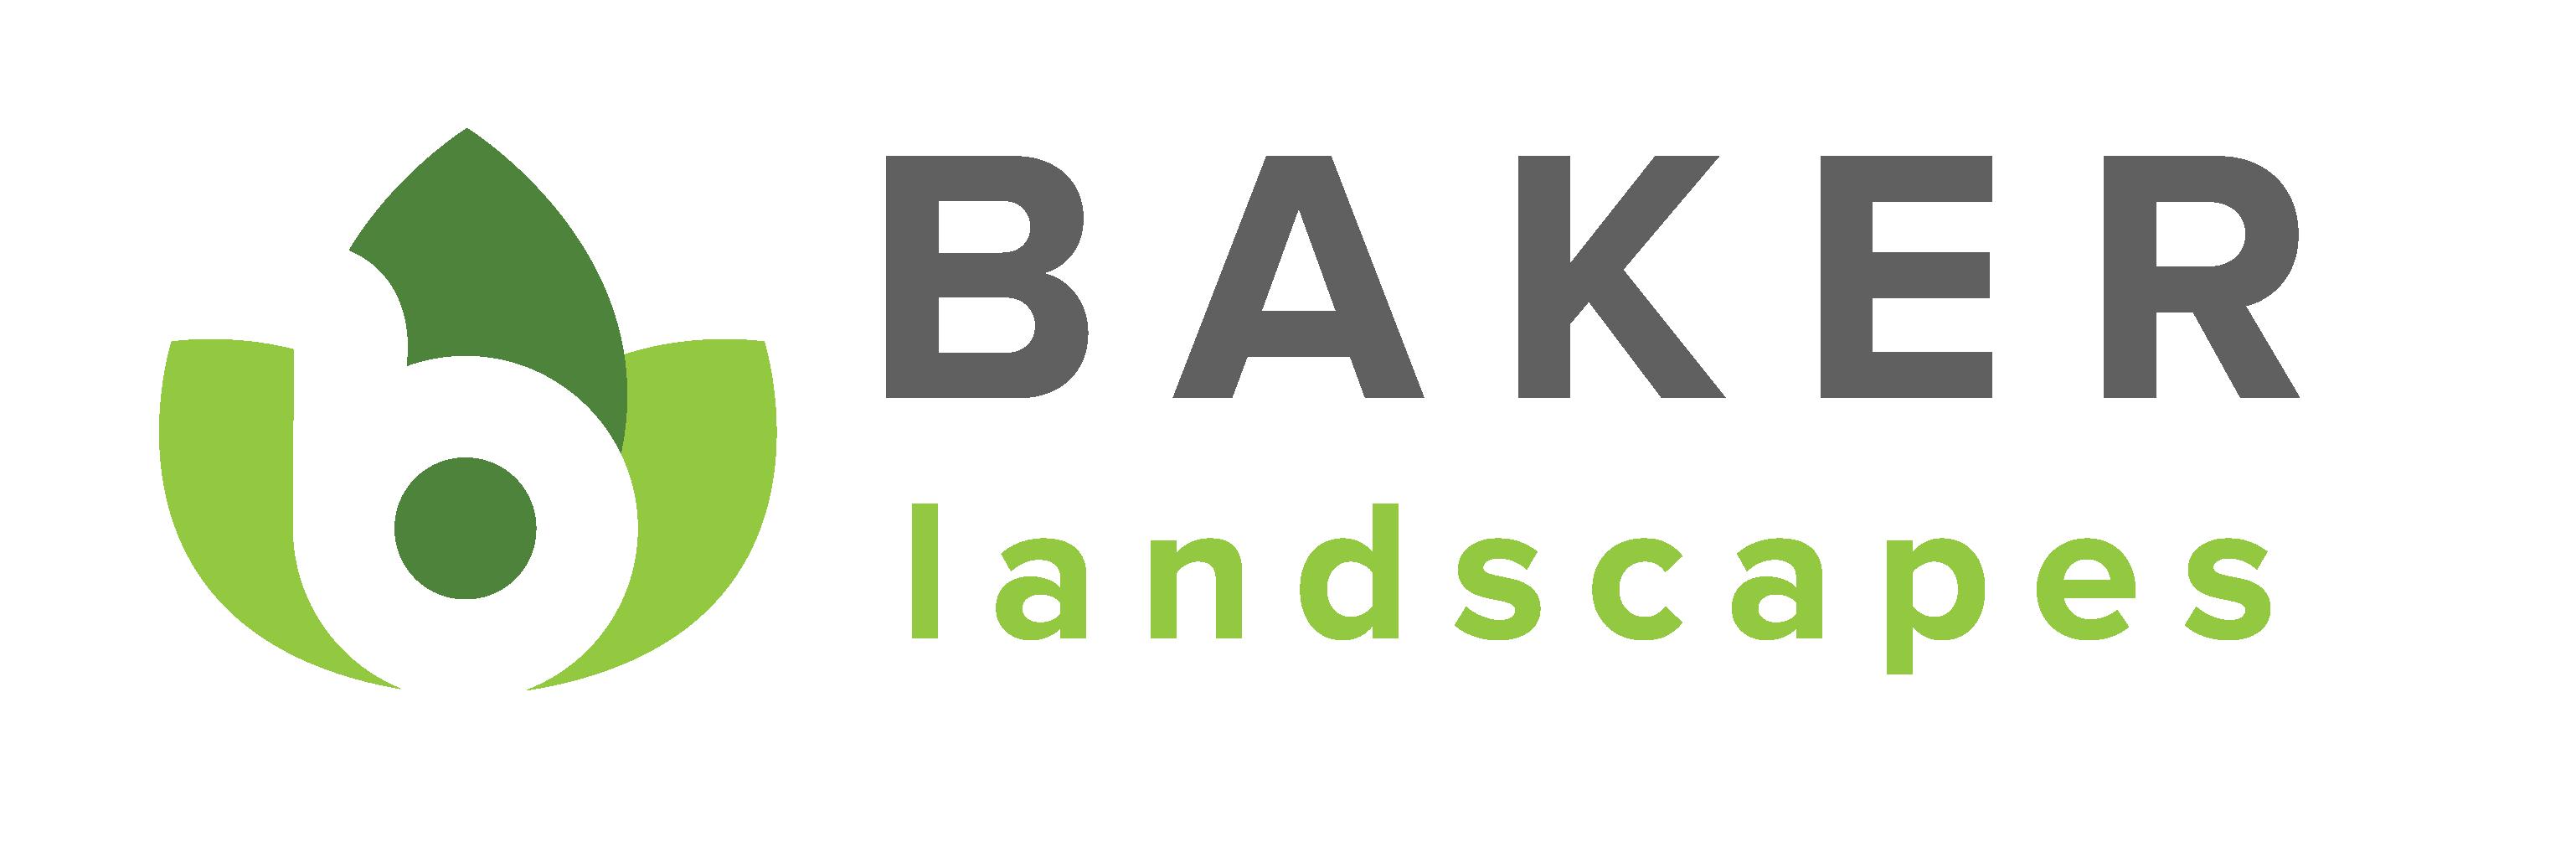 Baker Landscapes + Lawn Horizontal - Erica Zoller Creative